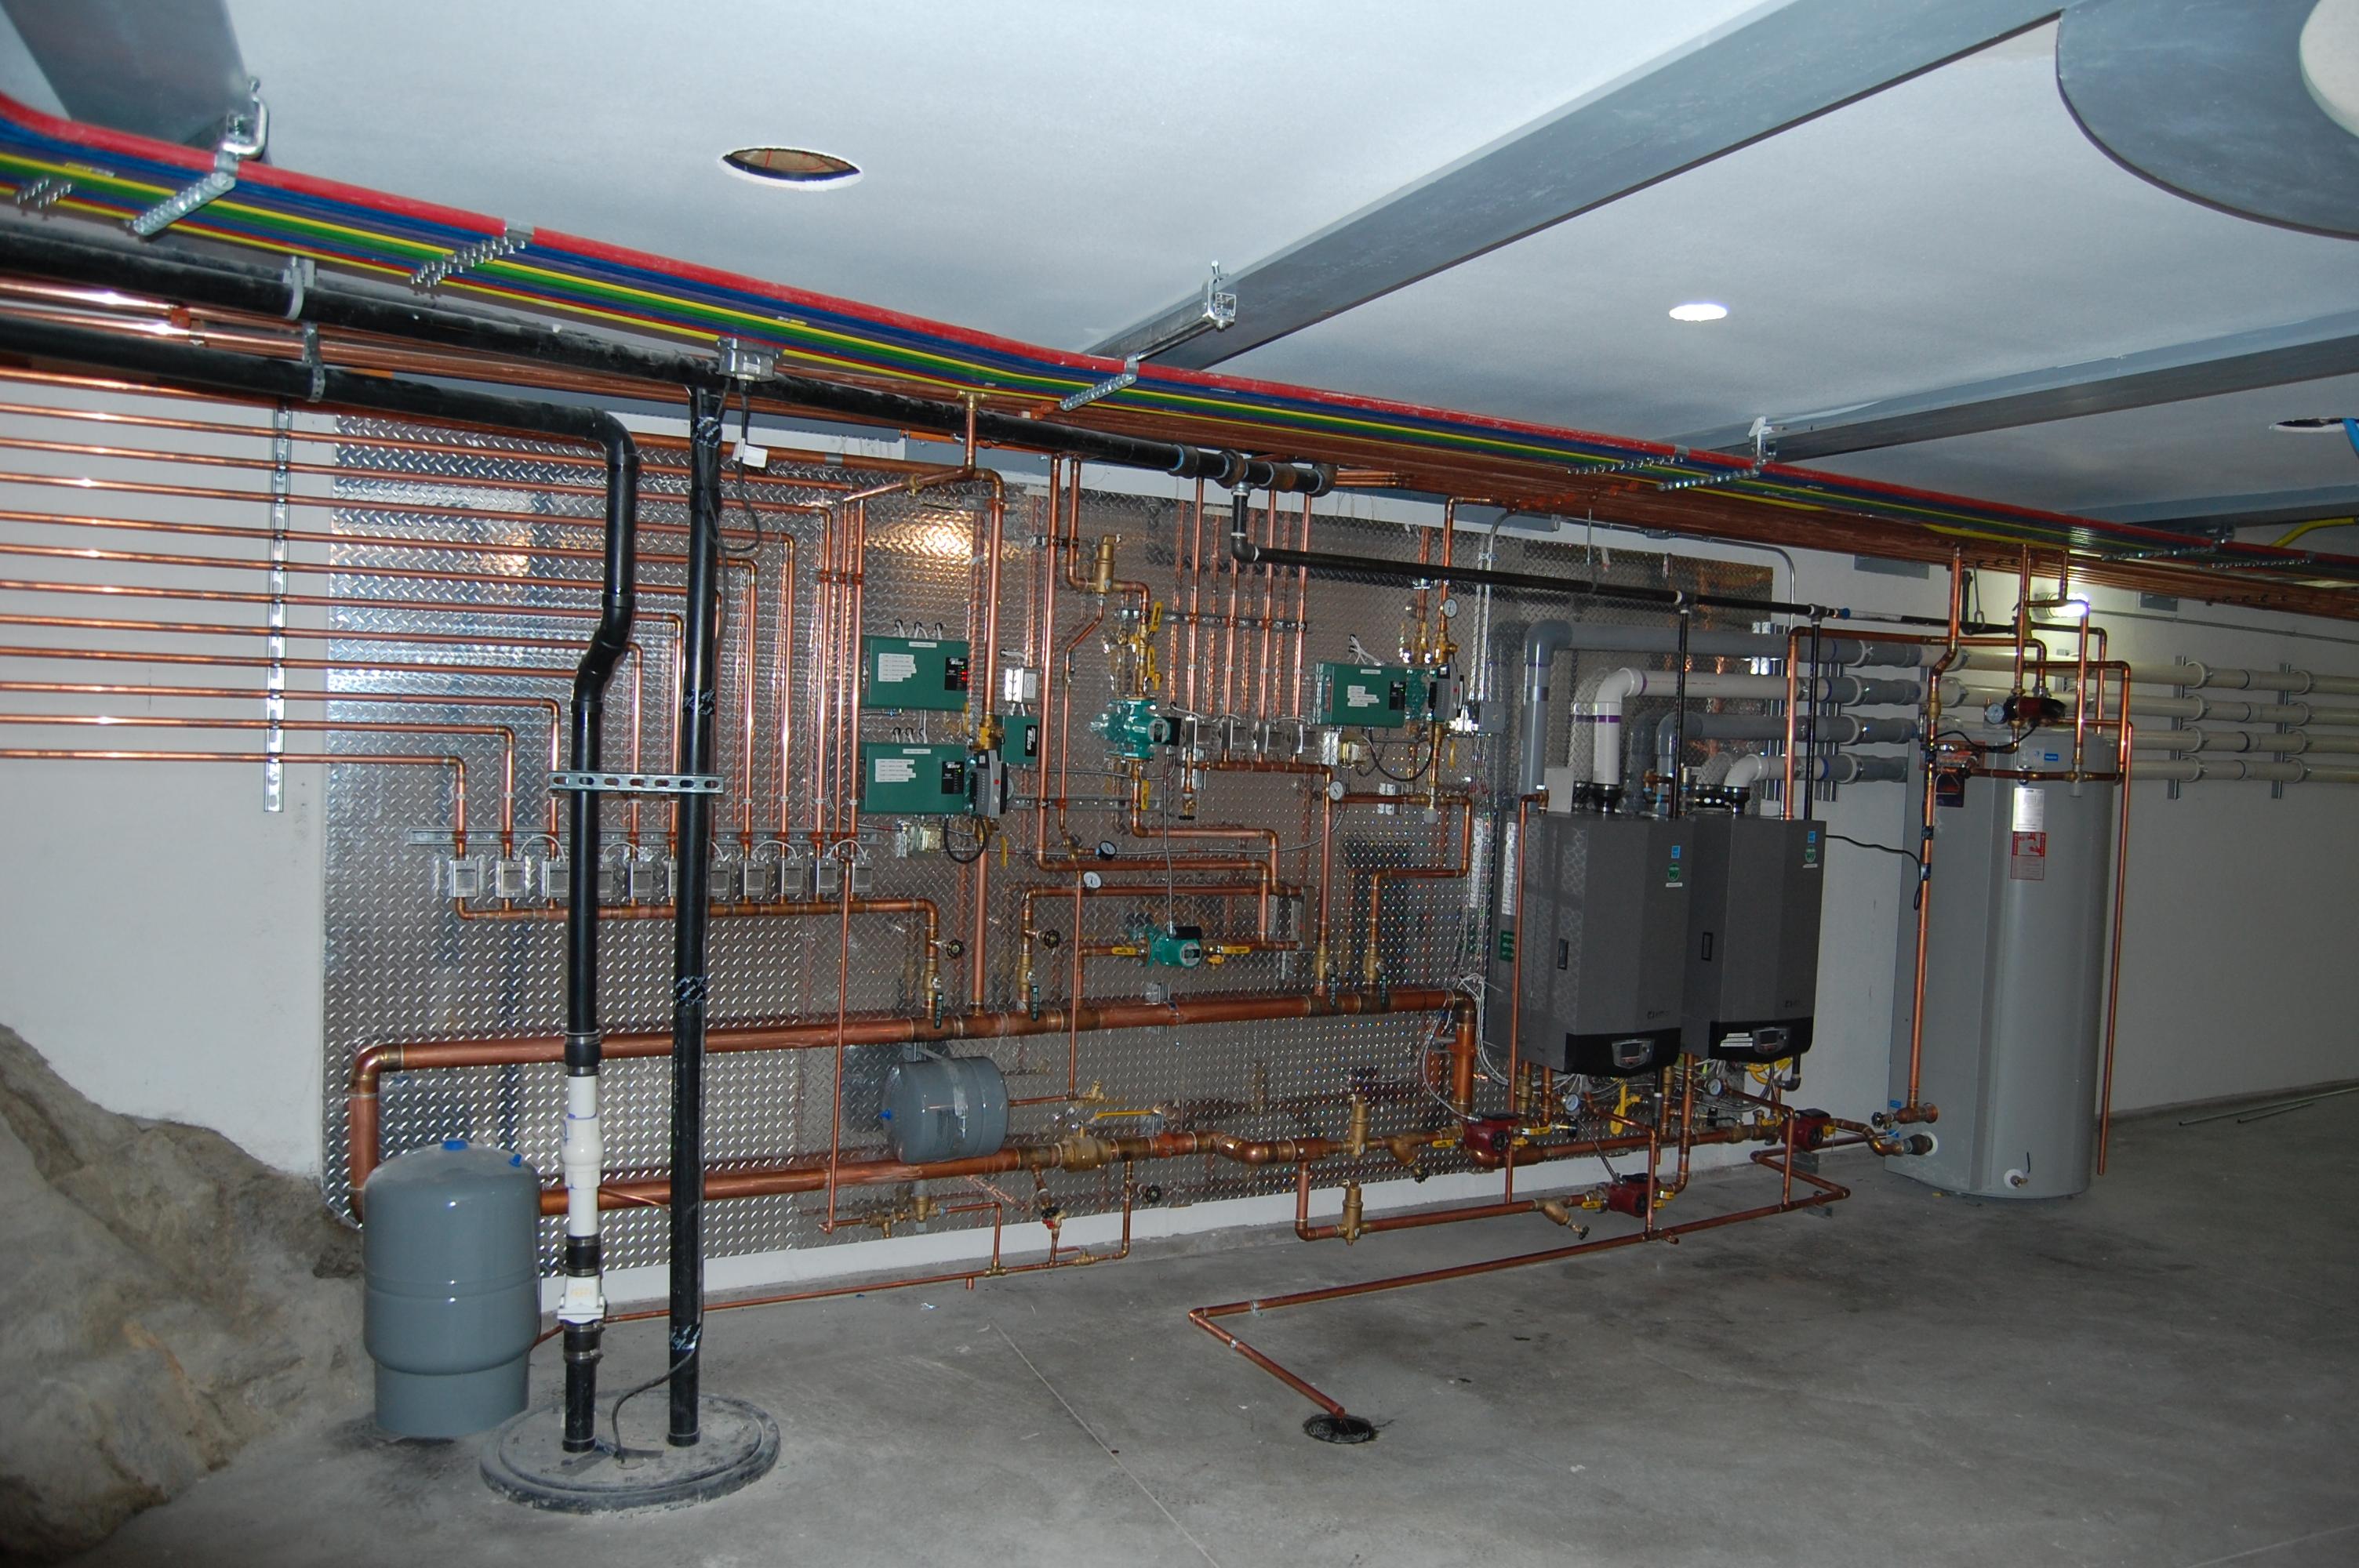 wiring diagram for lochinvar boilers peerless boiler